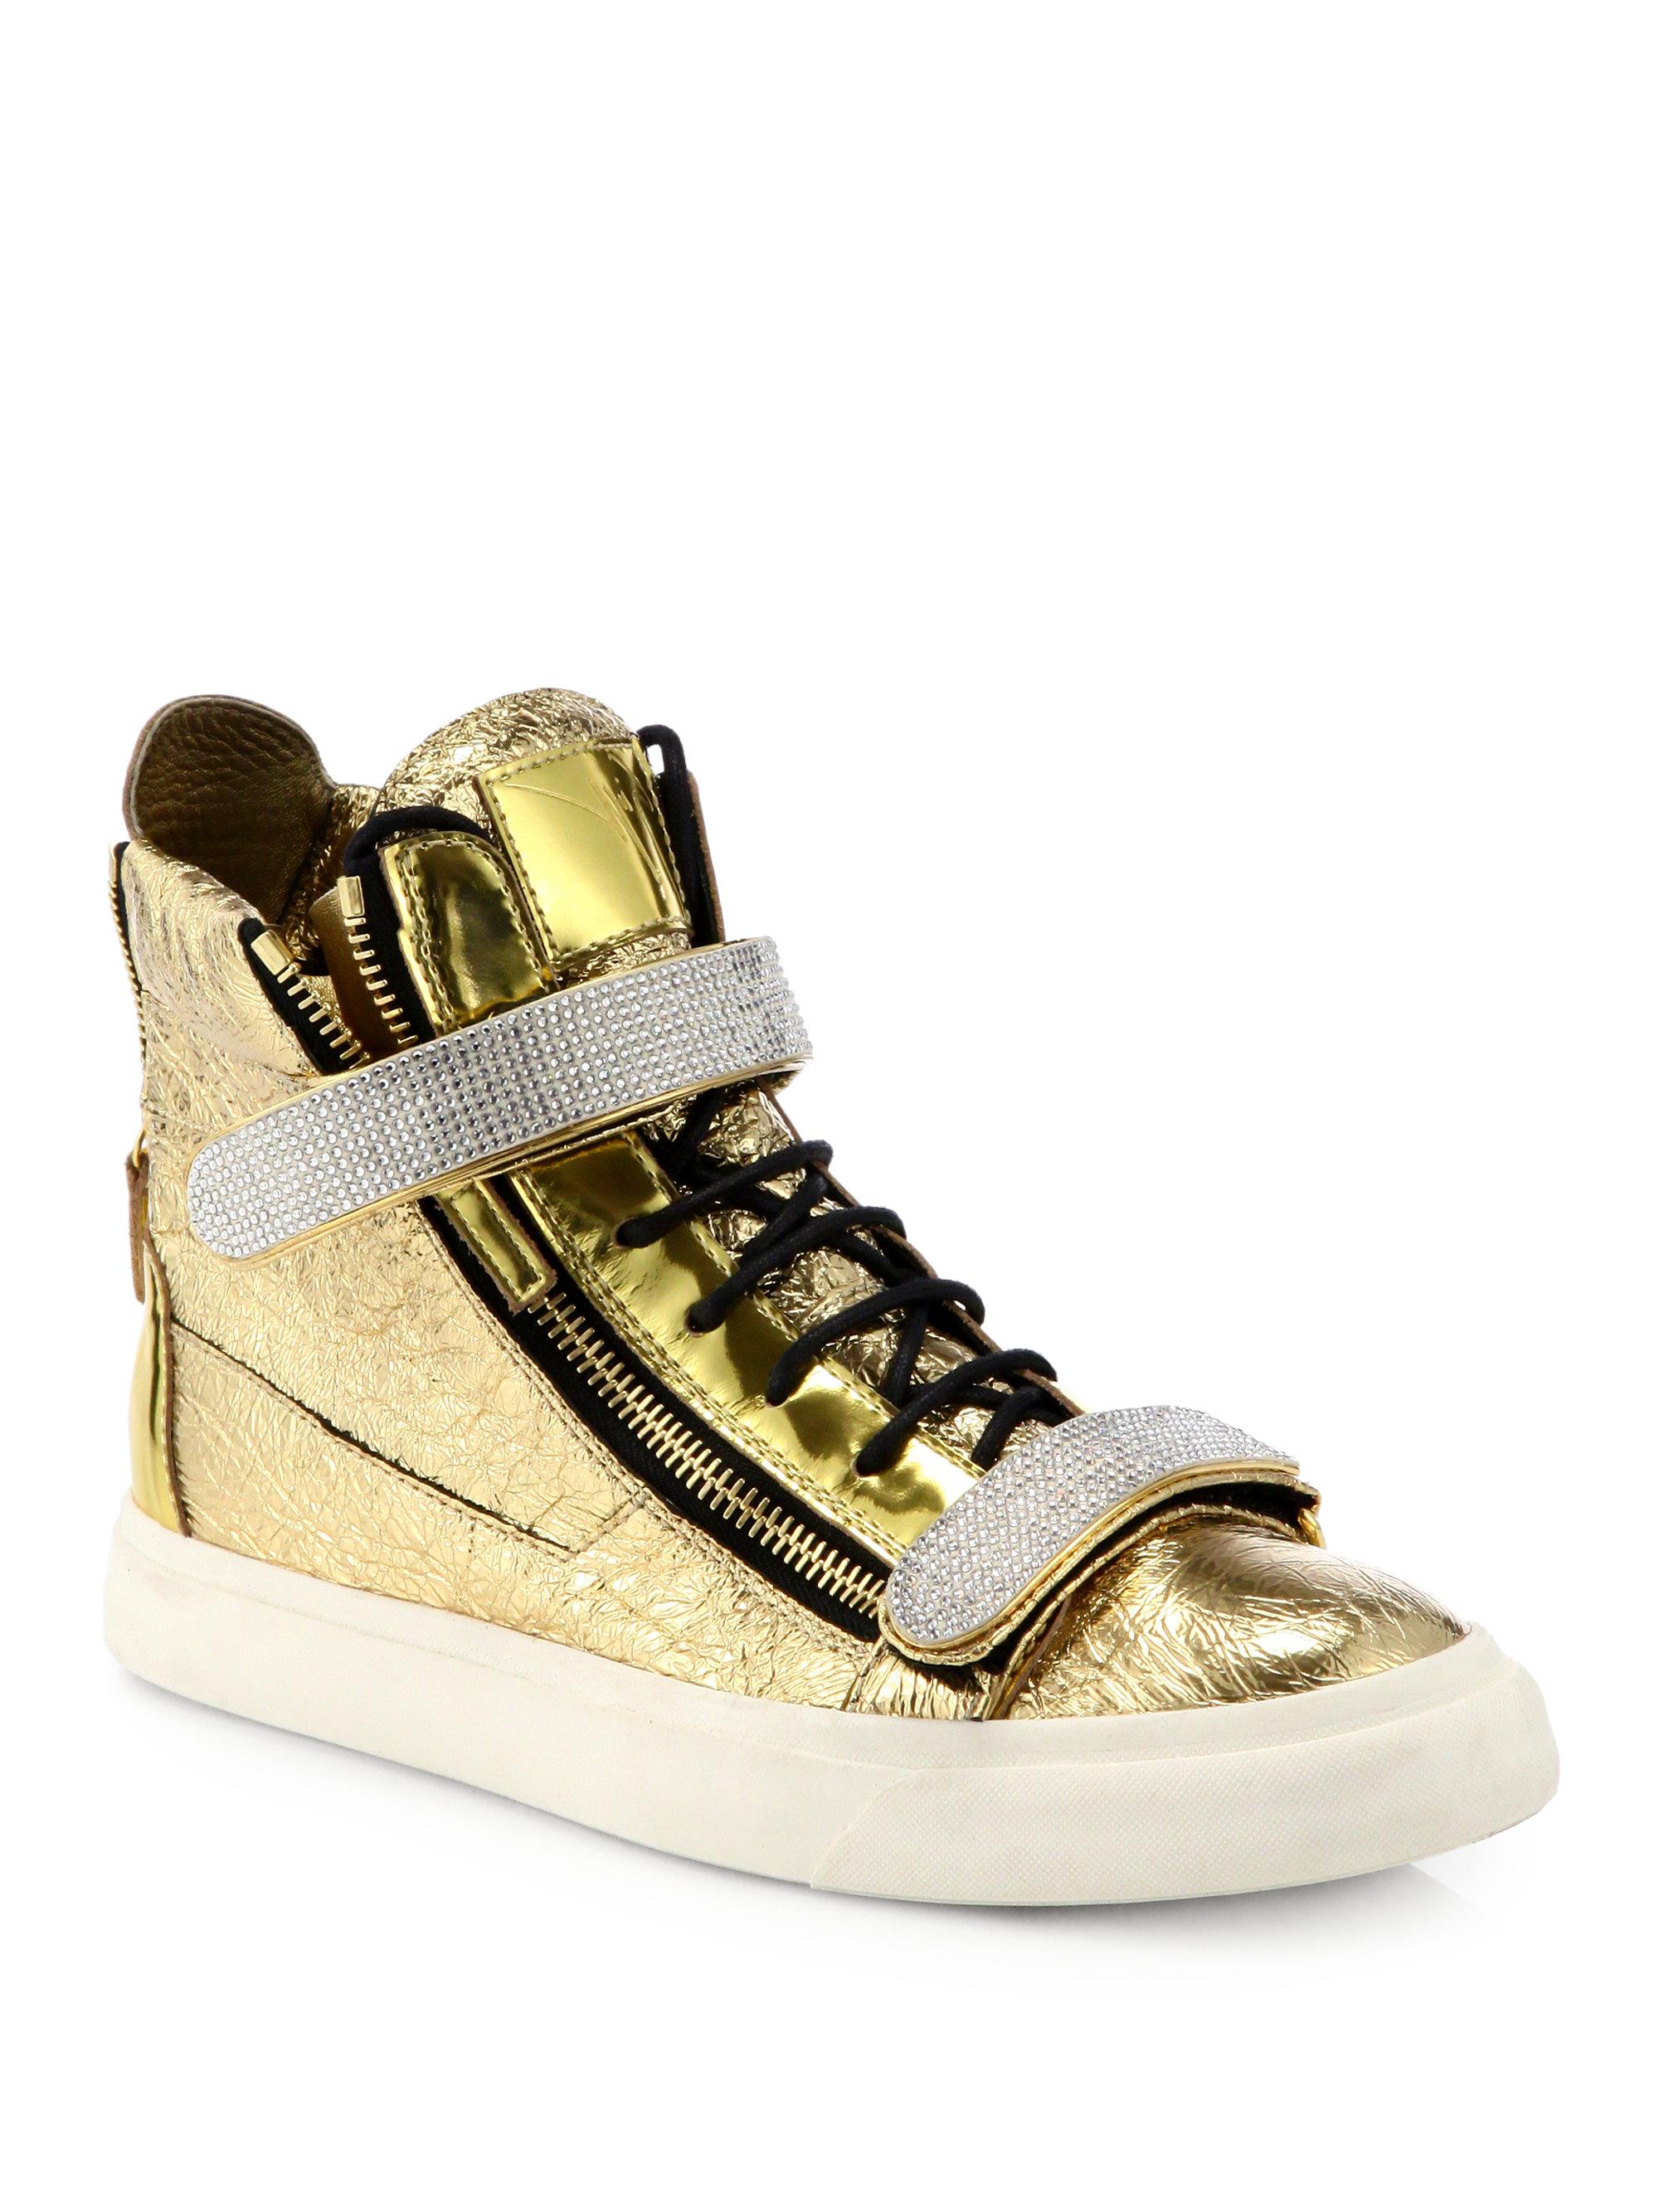 giuseppe zanotti foiled leather hightop sneakers in metallic for men lyst. Black Bedroom Furniture Sets. Home Design Ideas